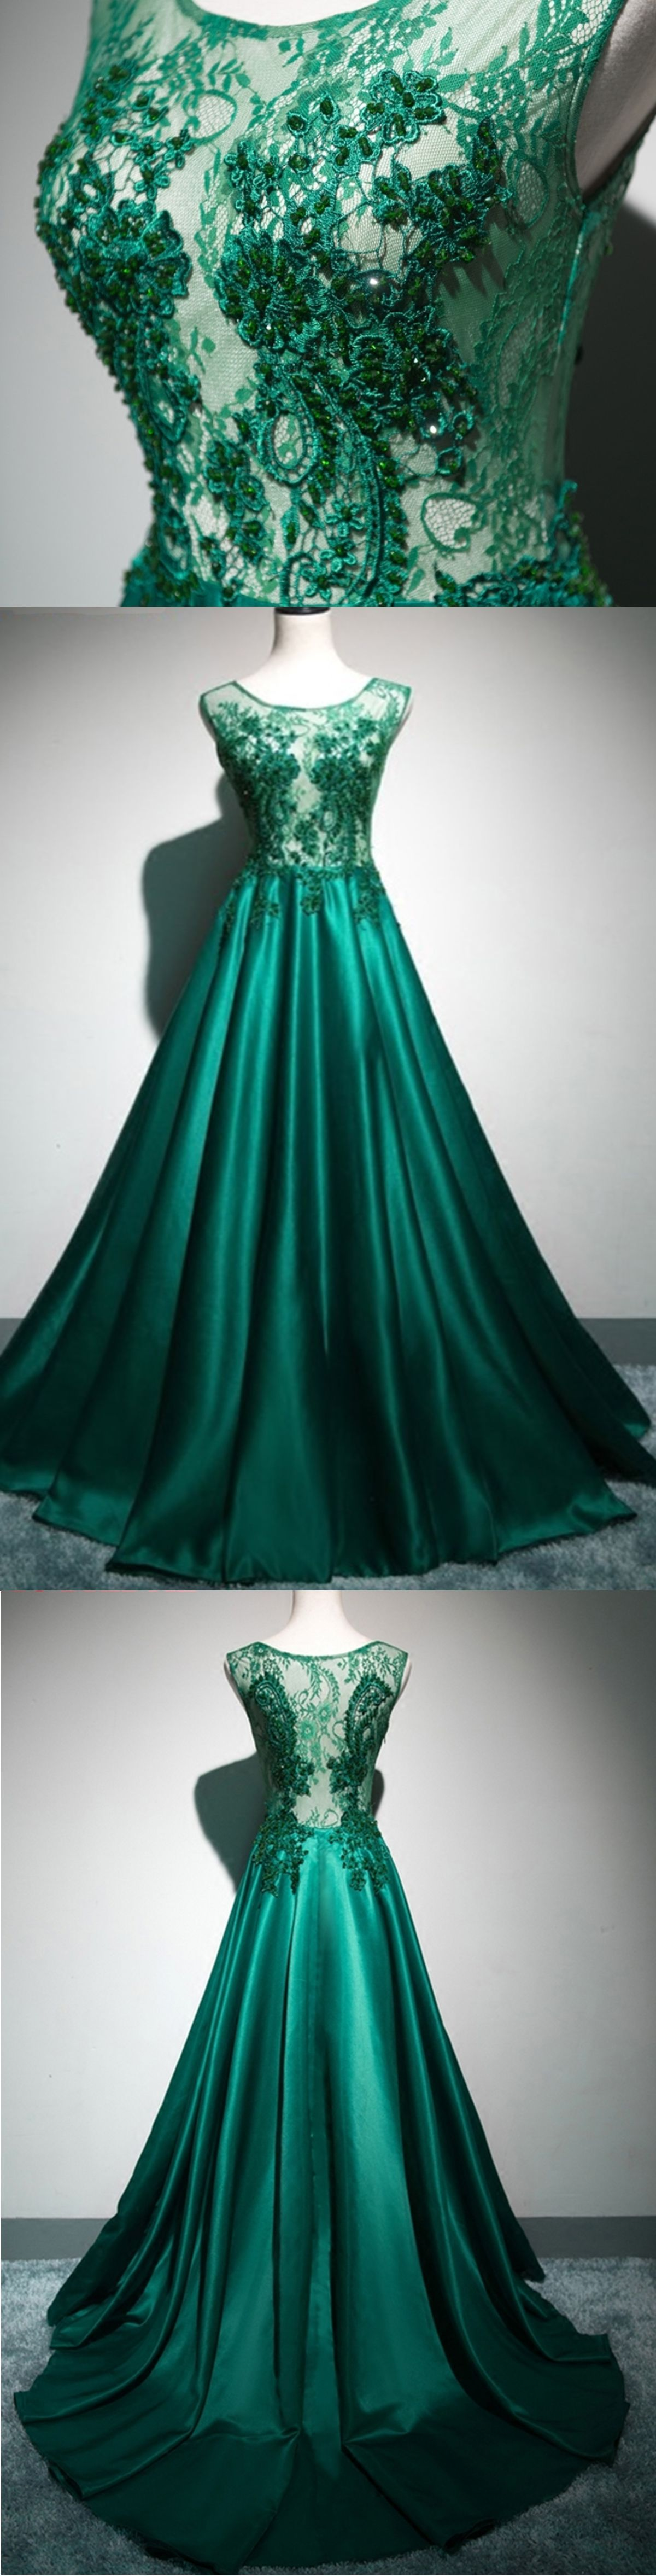 Deep green satin long lace top see through evening dresses long